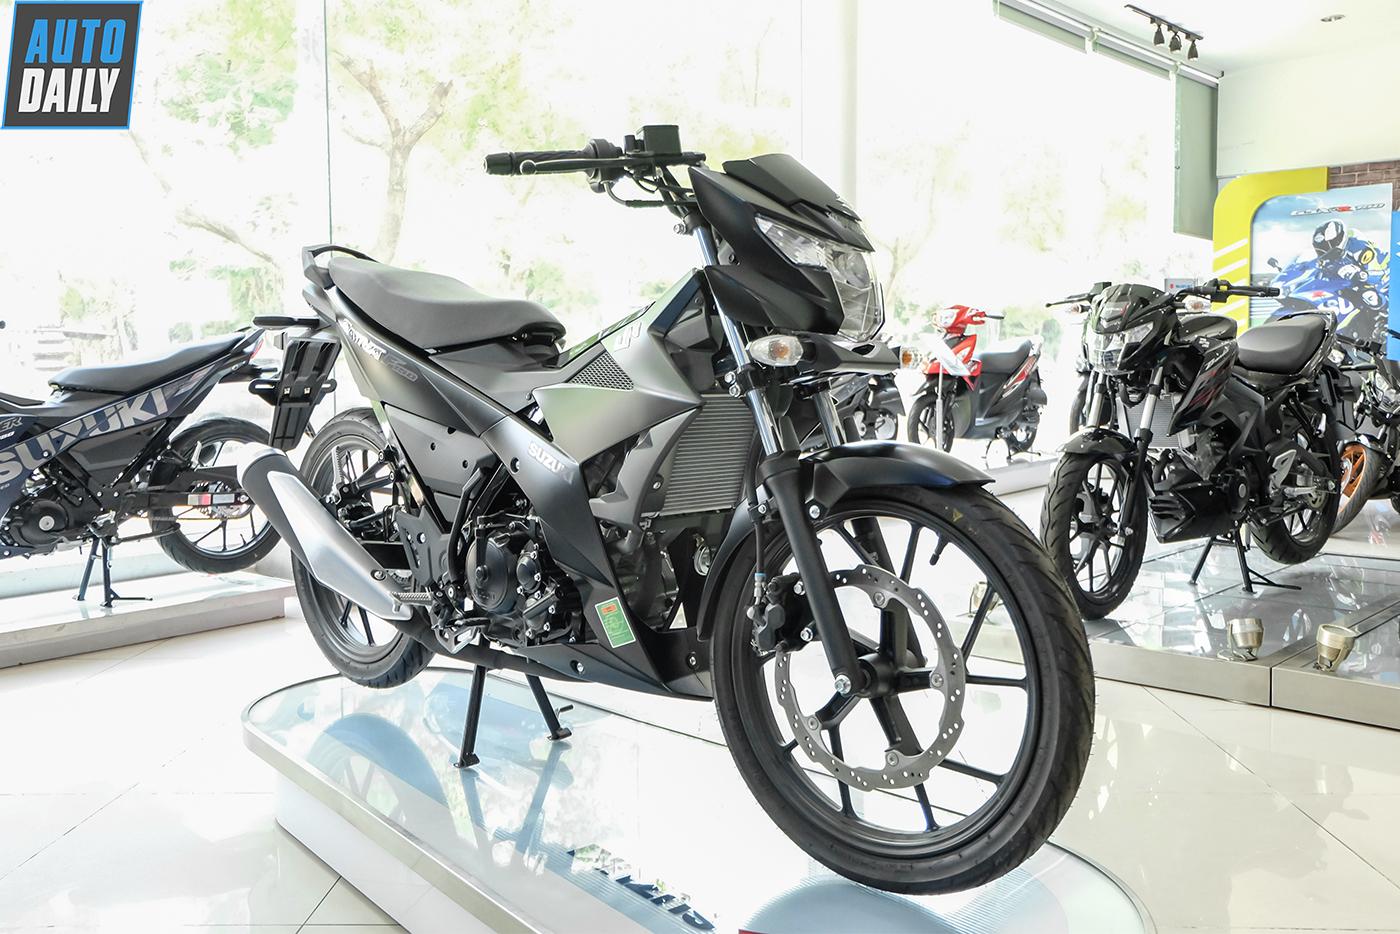 Chi tiết Suzuki Satria F150 nhập chính hãng có giá từ 51,99 triệu đồng suzuki-satria-f150-20.jpg